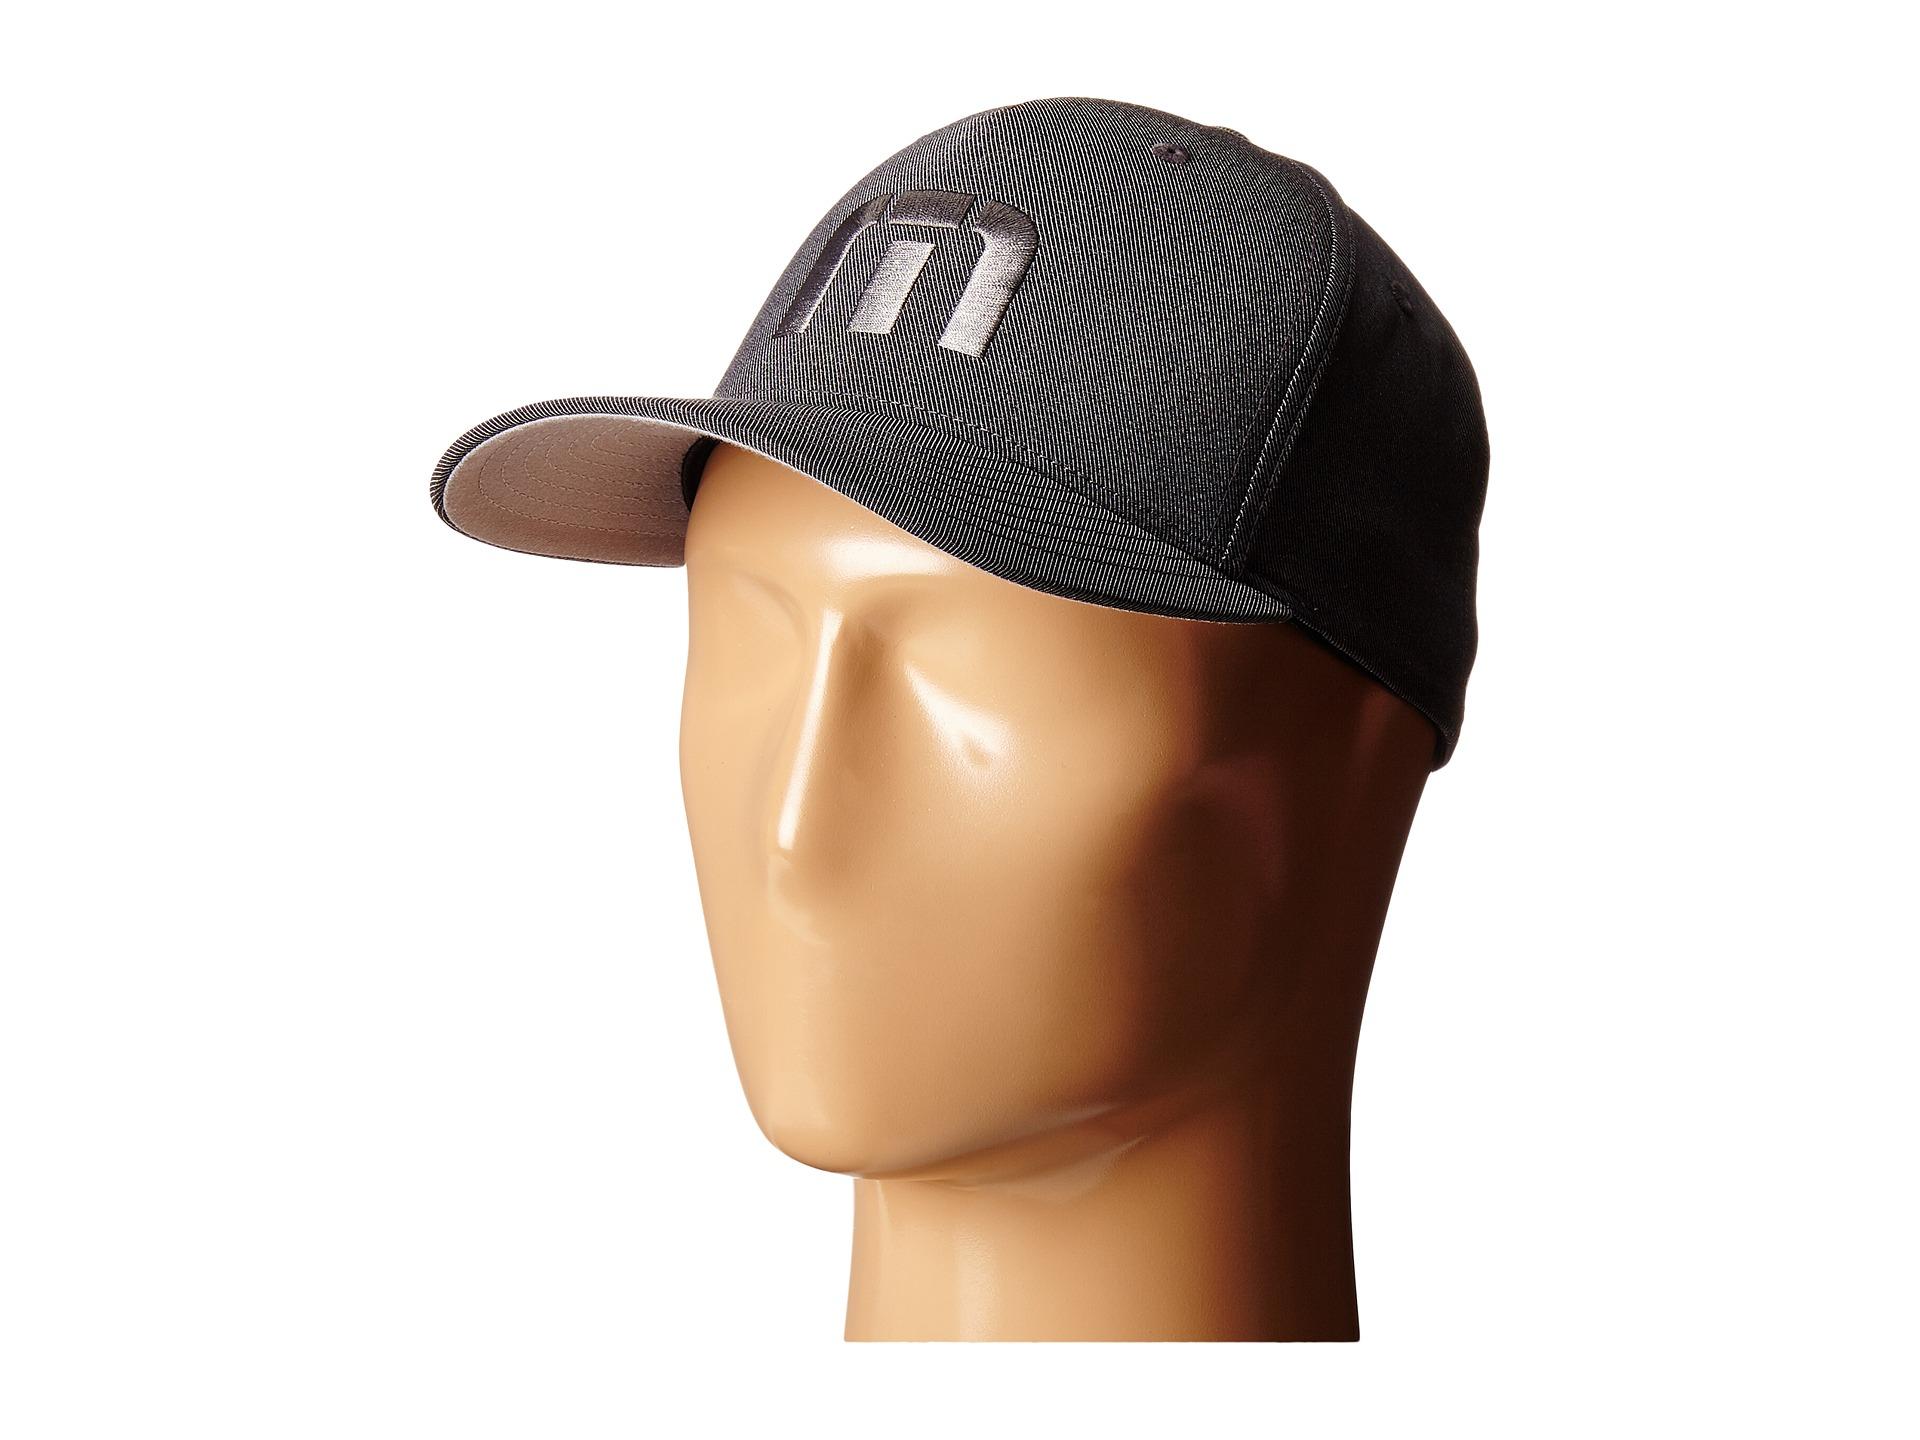 ... promo code for lyst travis mathew hawthorne hat in gray for men 38b46  ffd1b e60298d9b9a3